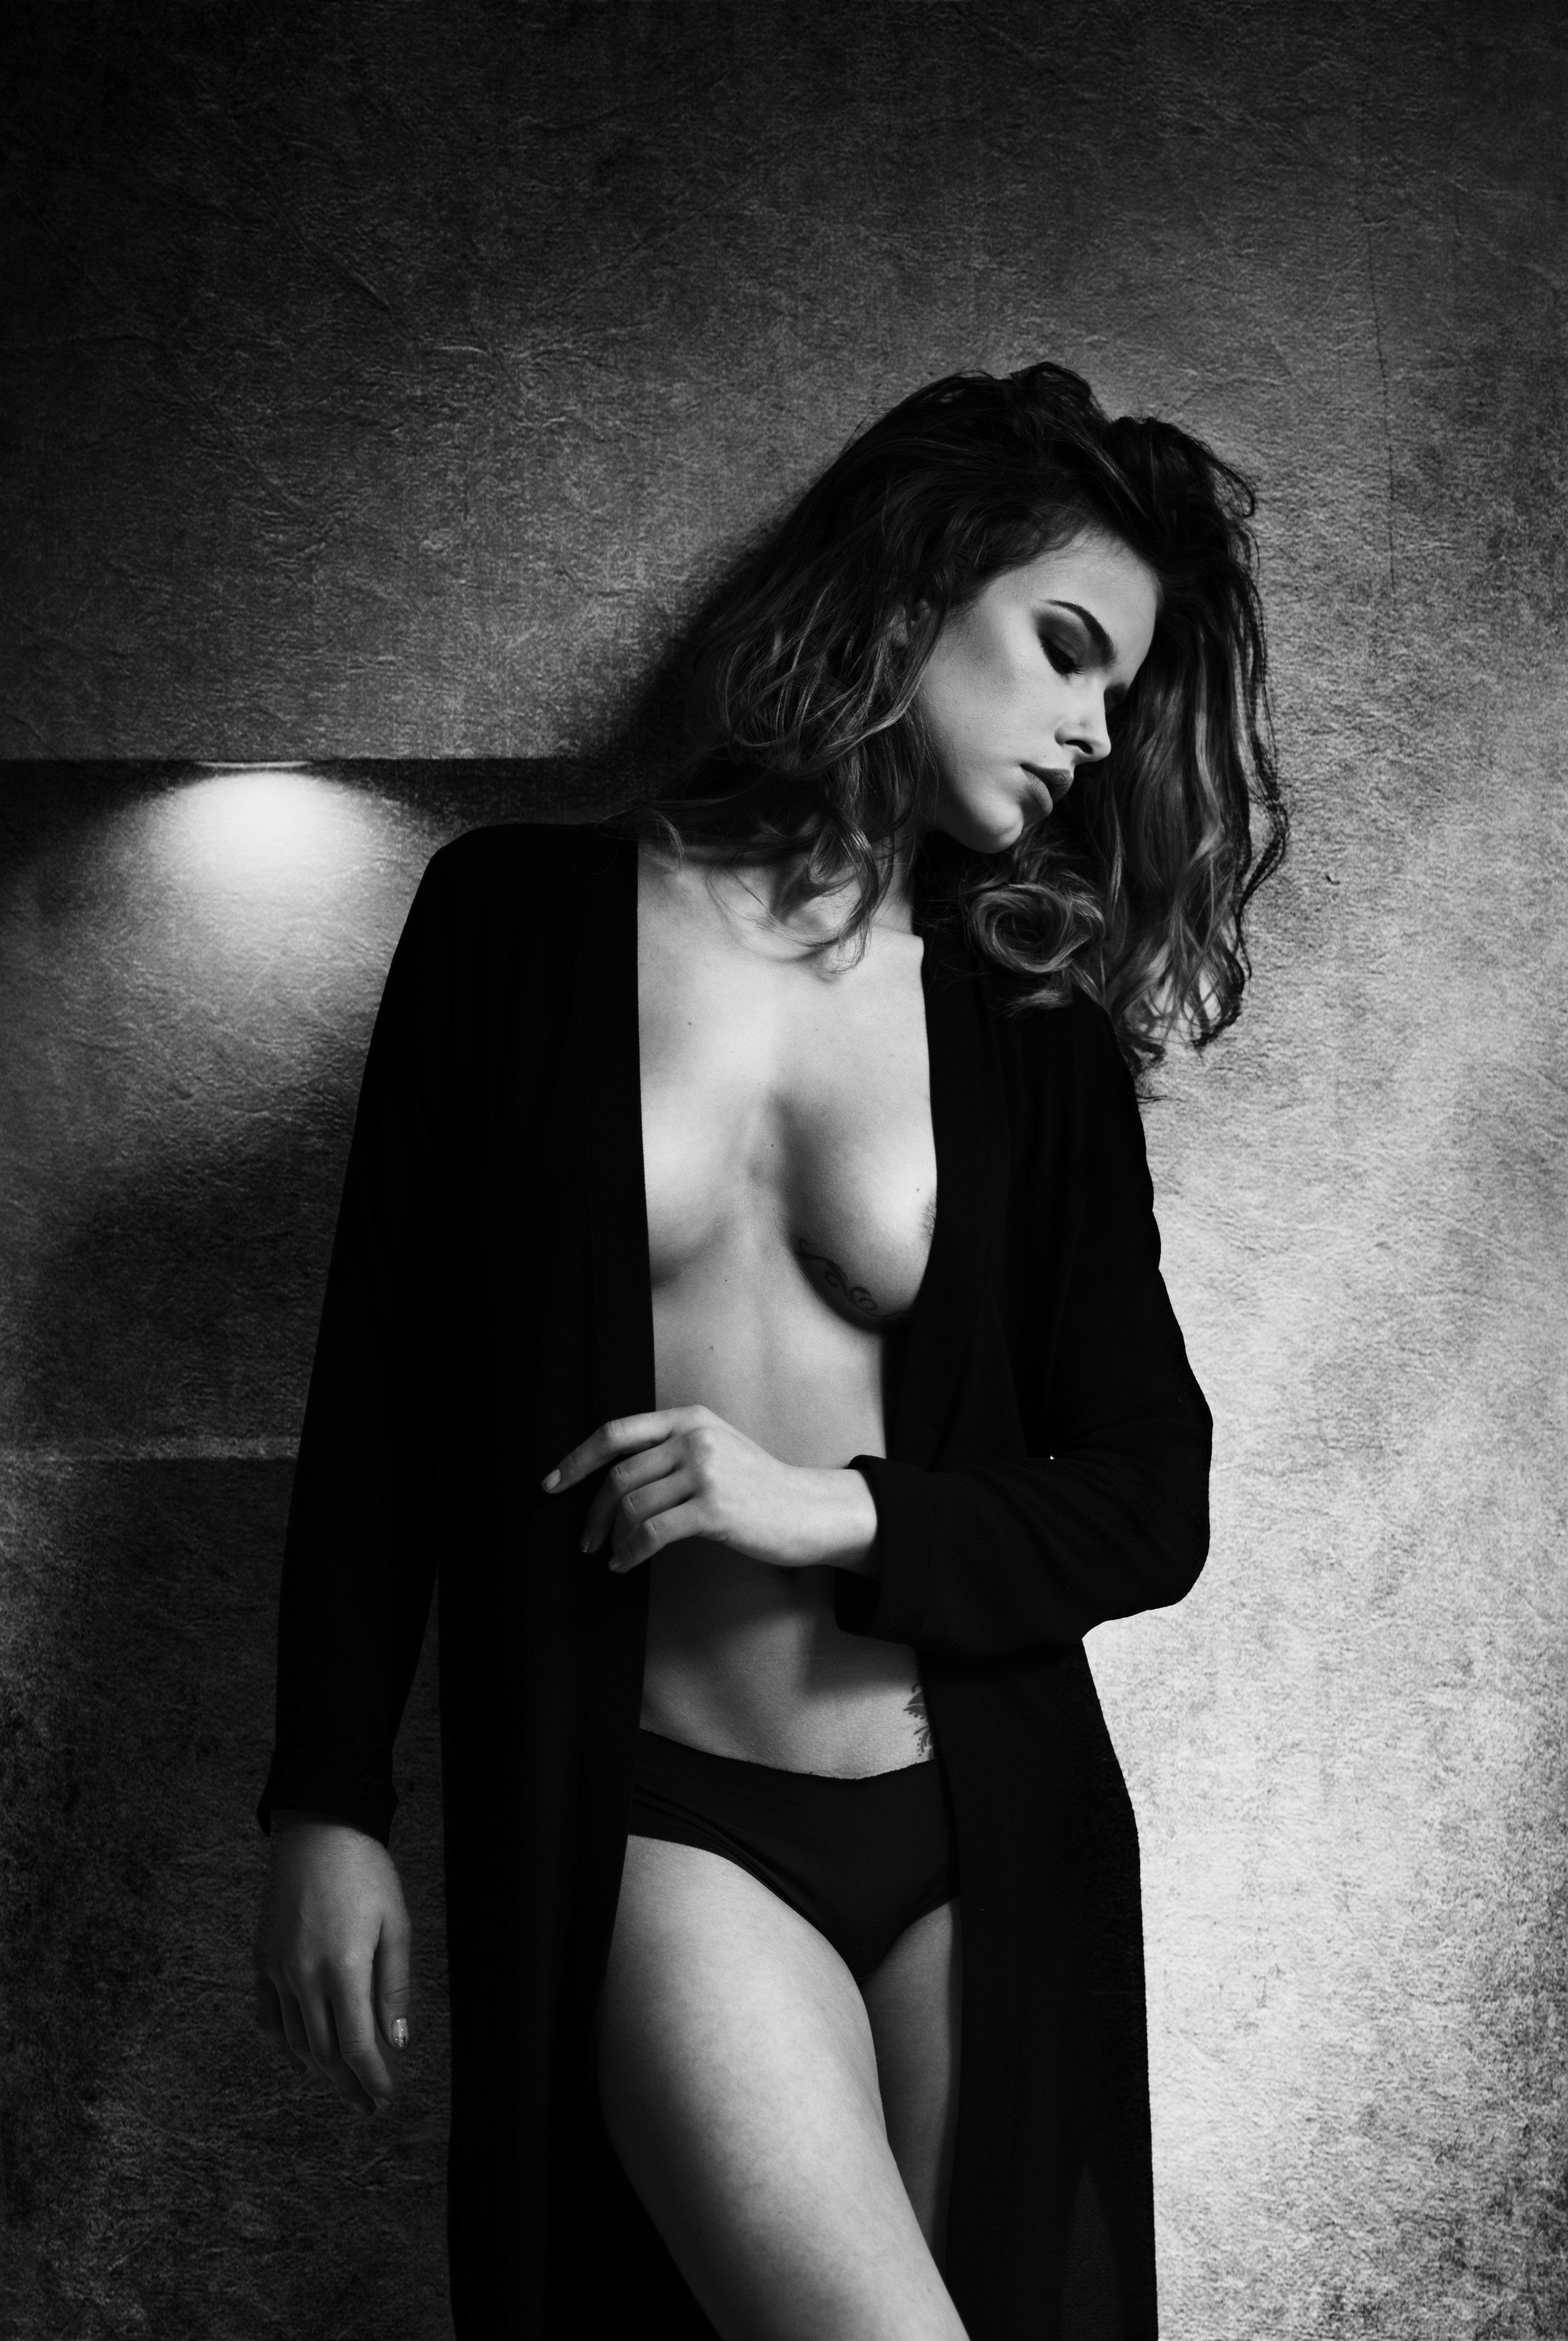 black and white, boudoir, girl, glamour, , Atanas Donev